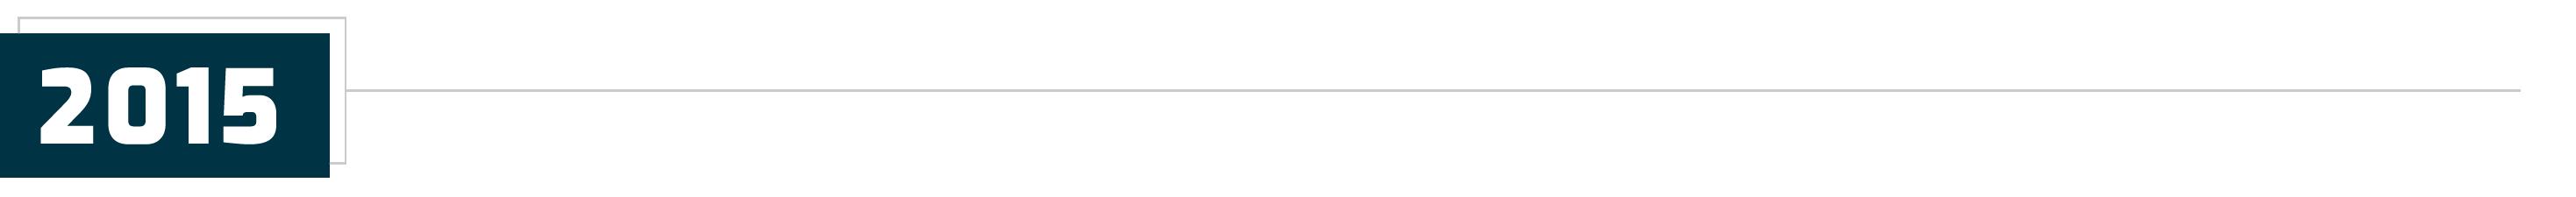 Choice Bank Timeline 2015